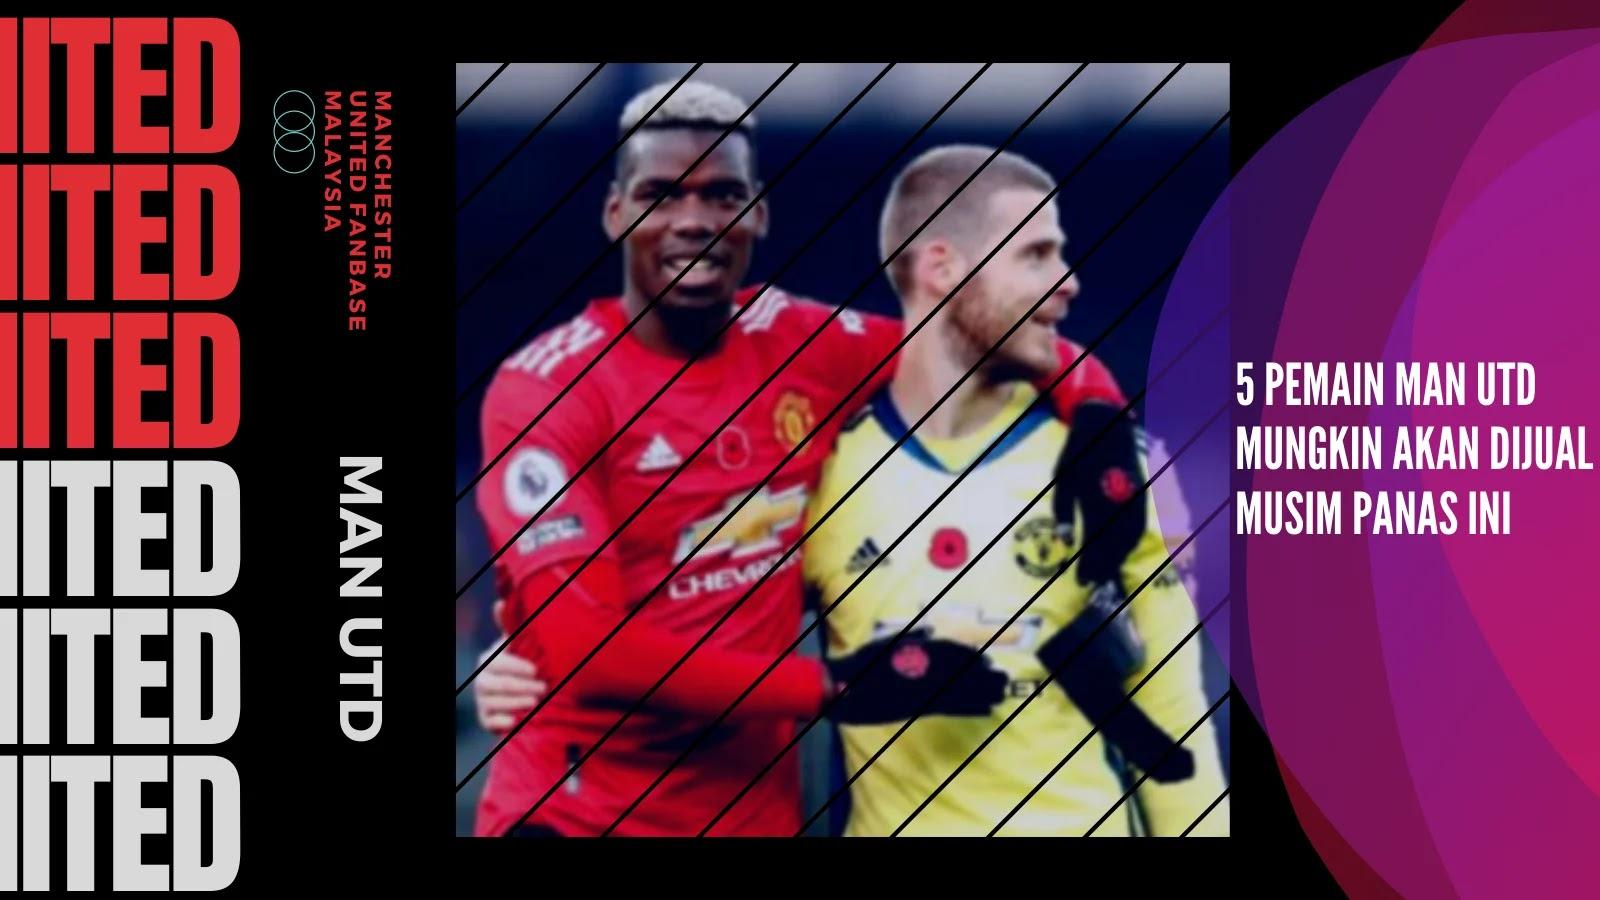 Lima Pemain Man United Mungkin akan Dijual Musim Panas Ini